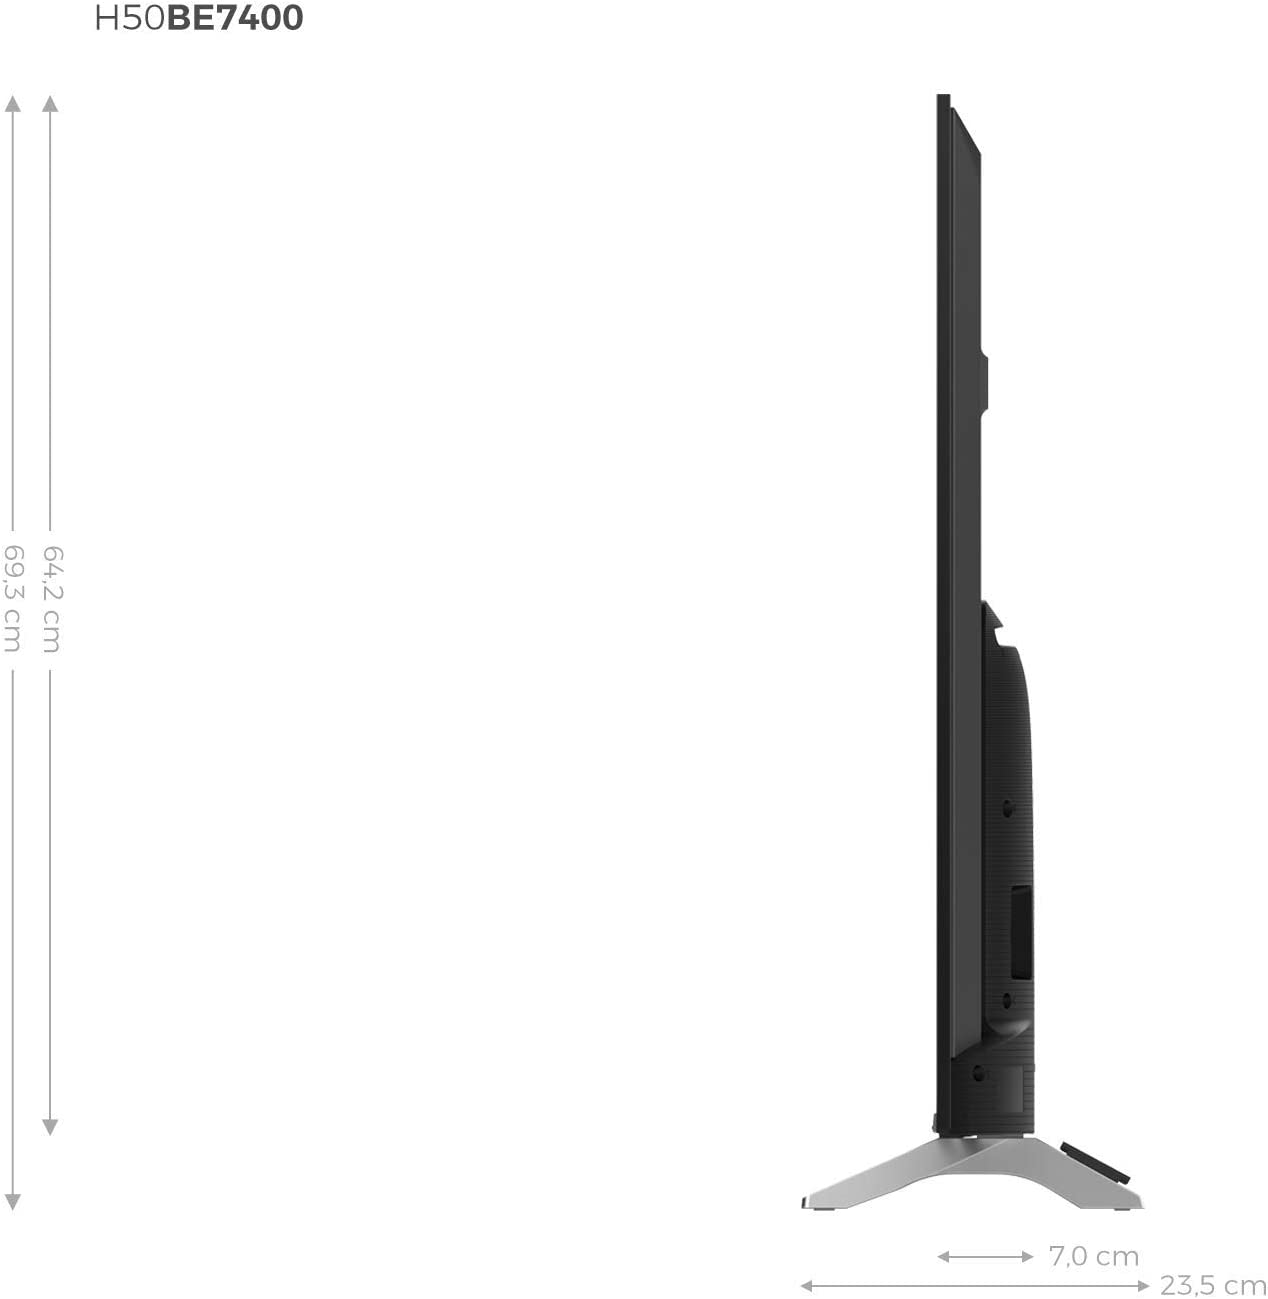 WiFi Smart TV VIDAA U 3.0 con IA Bluetooth Dolby Vision HDR 2 USB Hisense H43BE7400 Audio DTS Smart TV ULED 43 4K Ultra HD Salida /óptica 3 HDMI Procesador Quad Core Wide Color Gamut